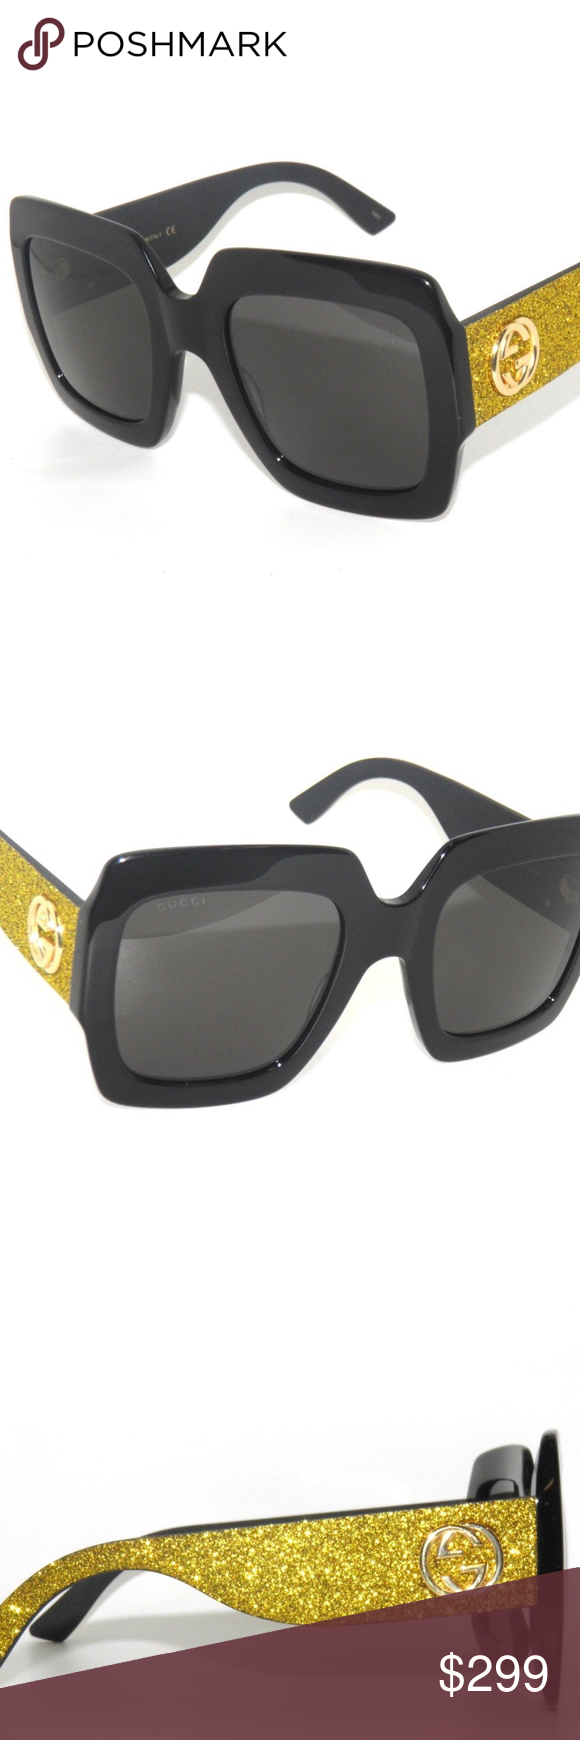 c1cf6d0a95f GUCCI GG0102S BLACK- GOLD GLITTER  GREY SUNGLASSES GUCCI GG0102S 0102S BLACK-  GOLD GLITTER